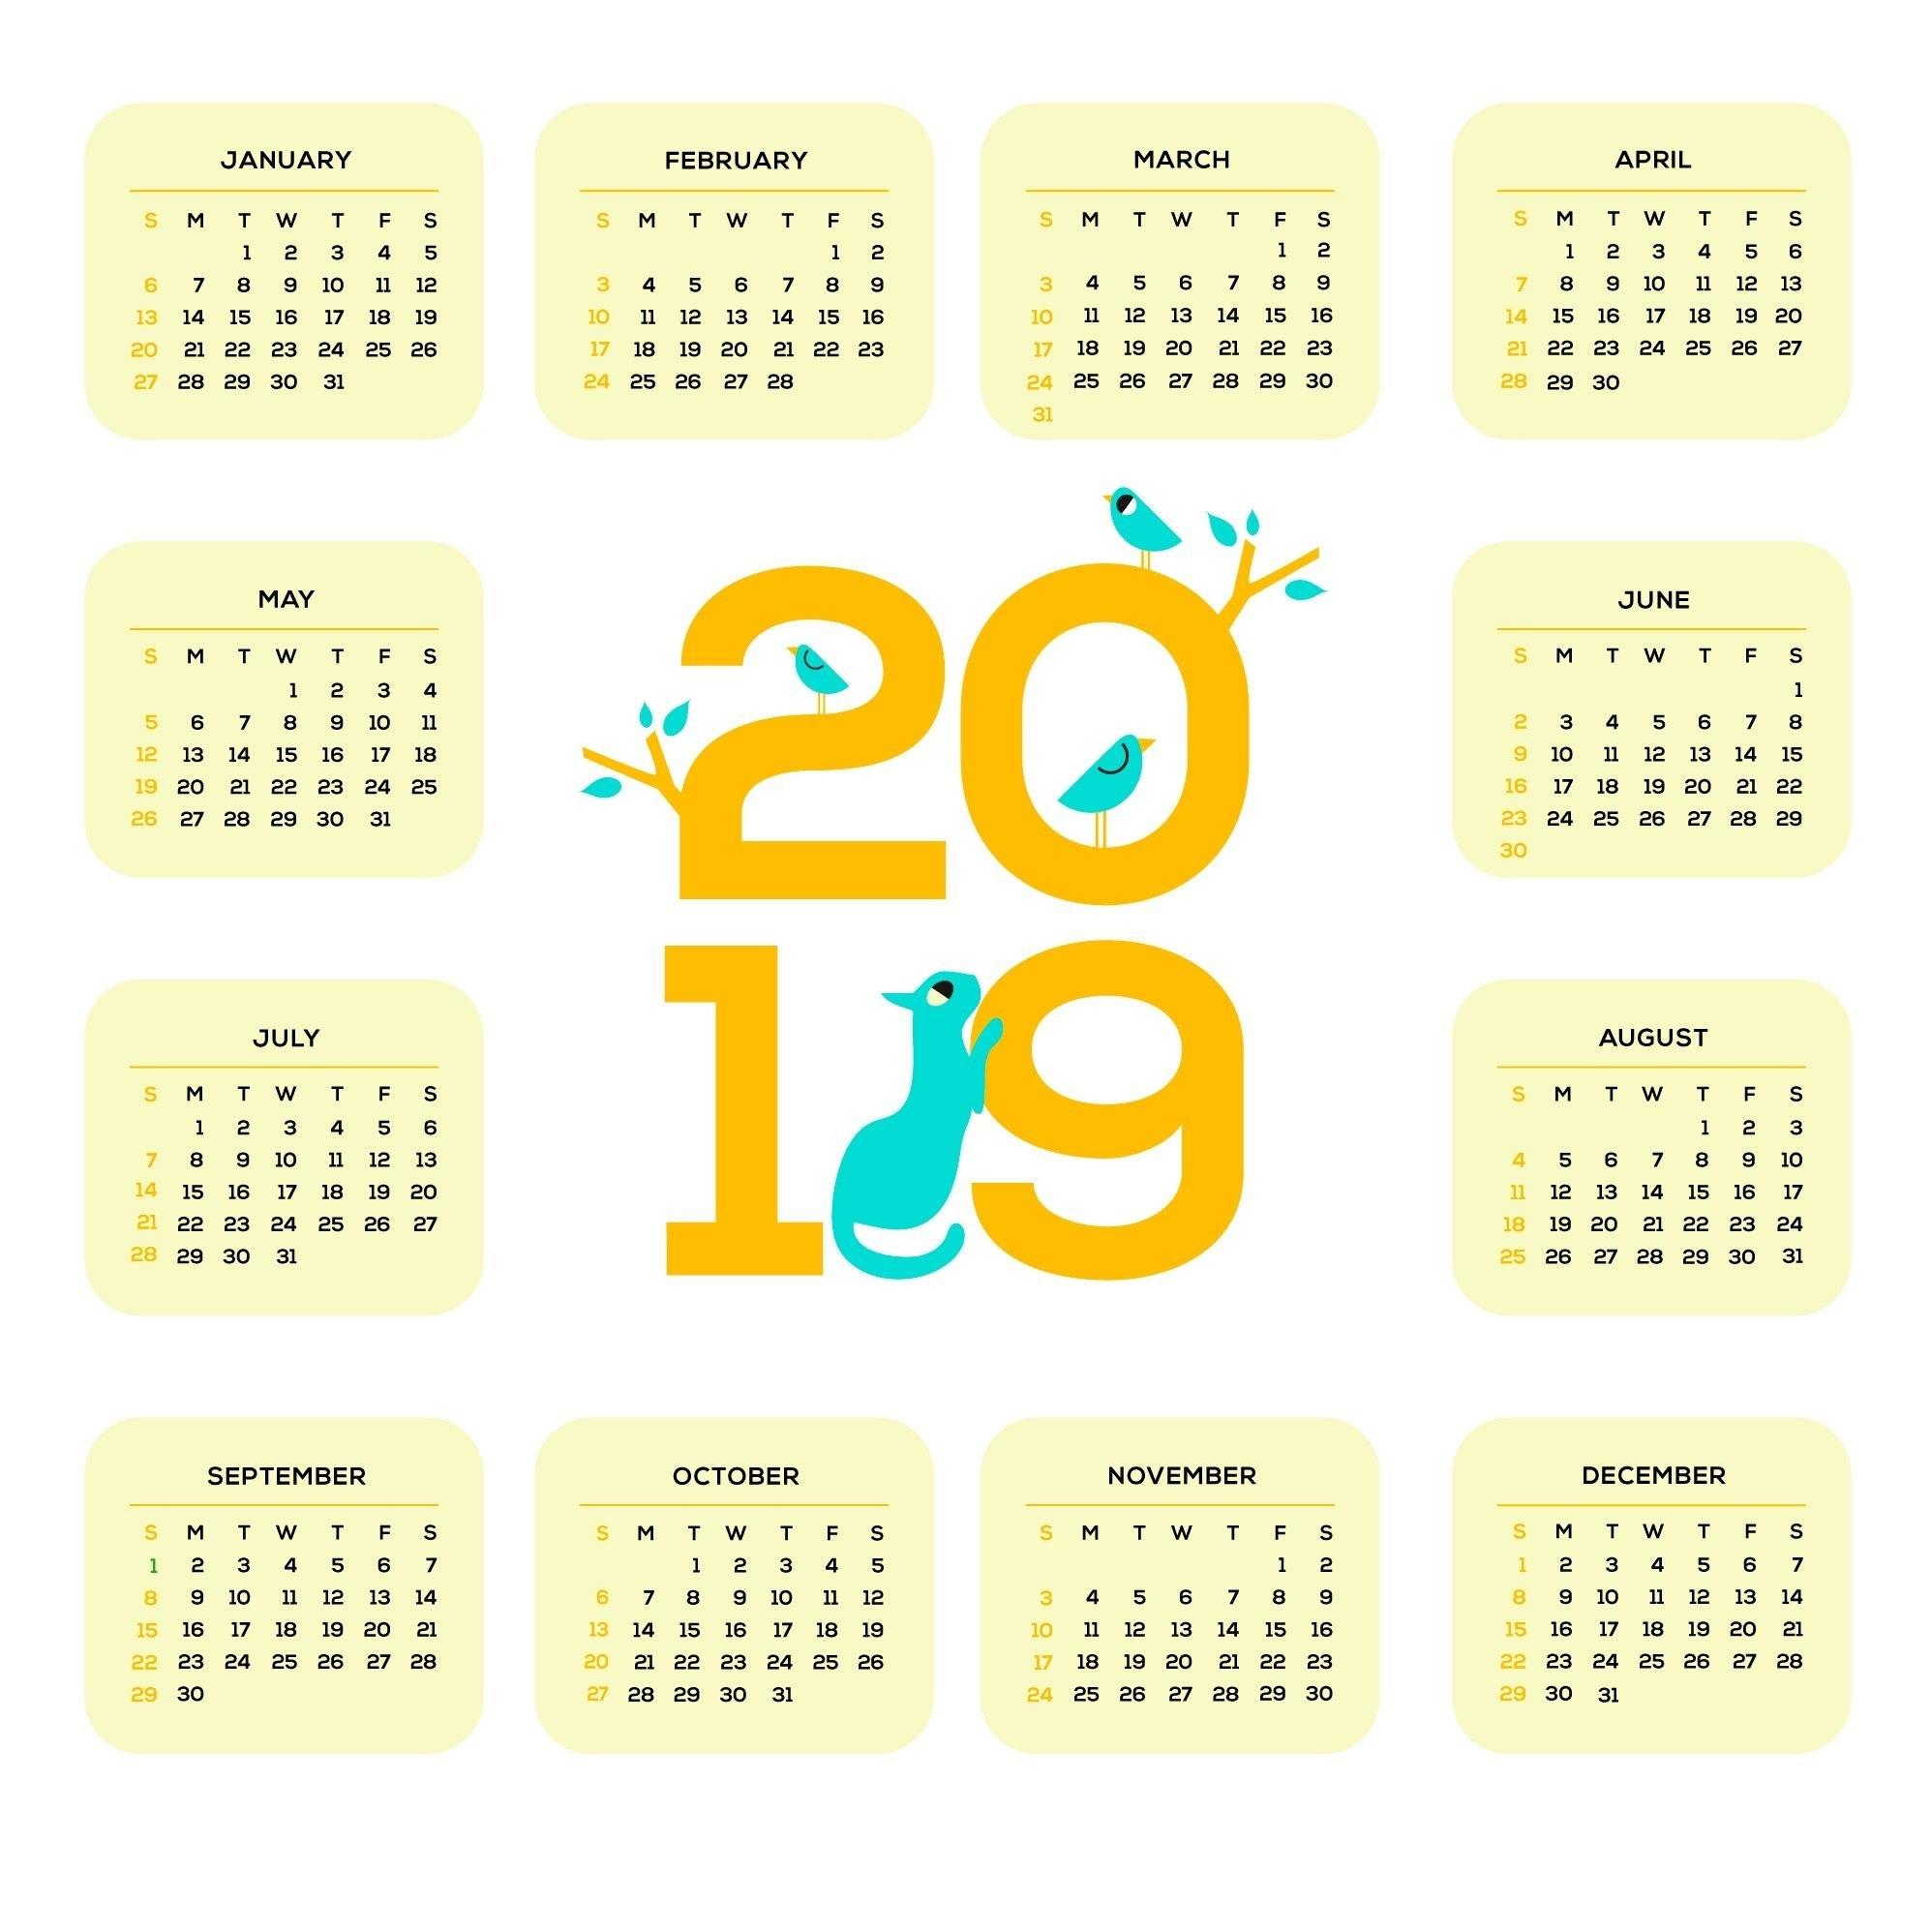 Printable 2019 One Page Calendar | Monthly Calendar Templates Calendar 2019 1 Page